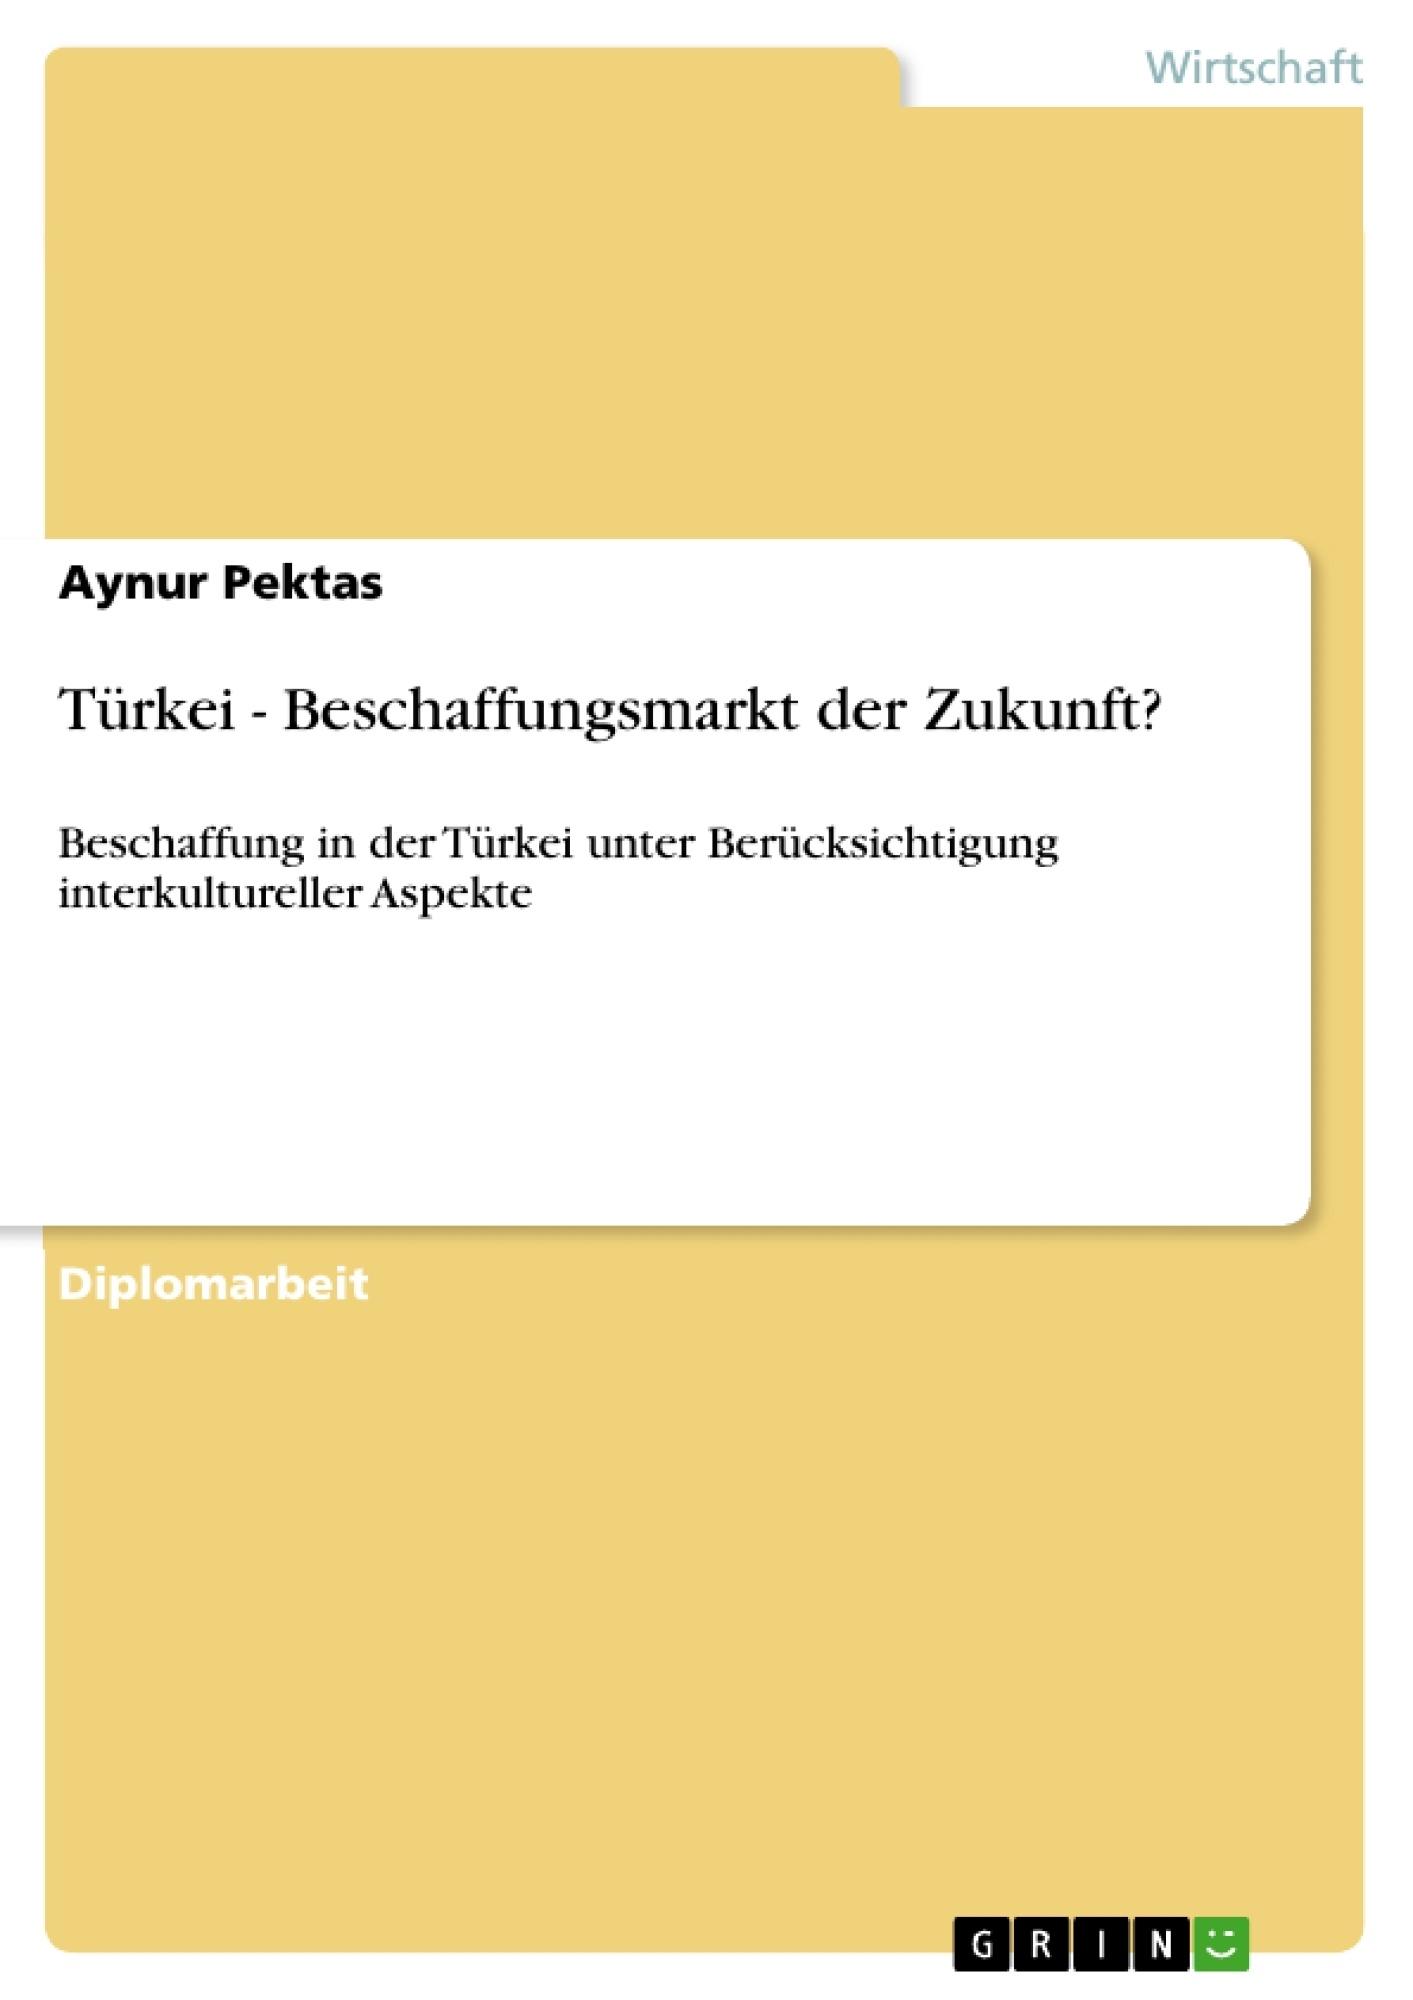 Titel: Türkei - Beschaffungsmarkt der Zukunft?